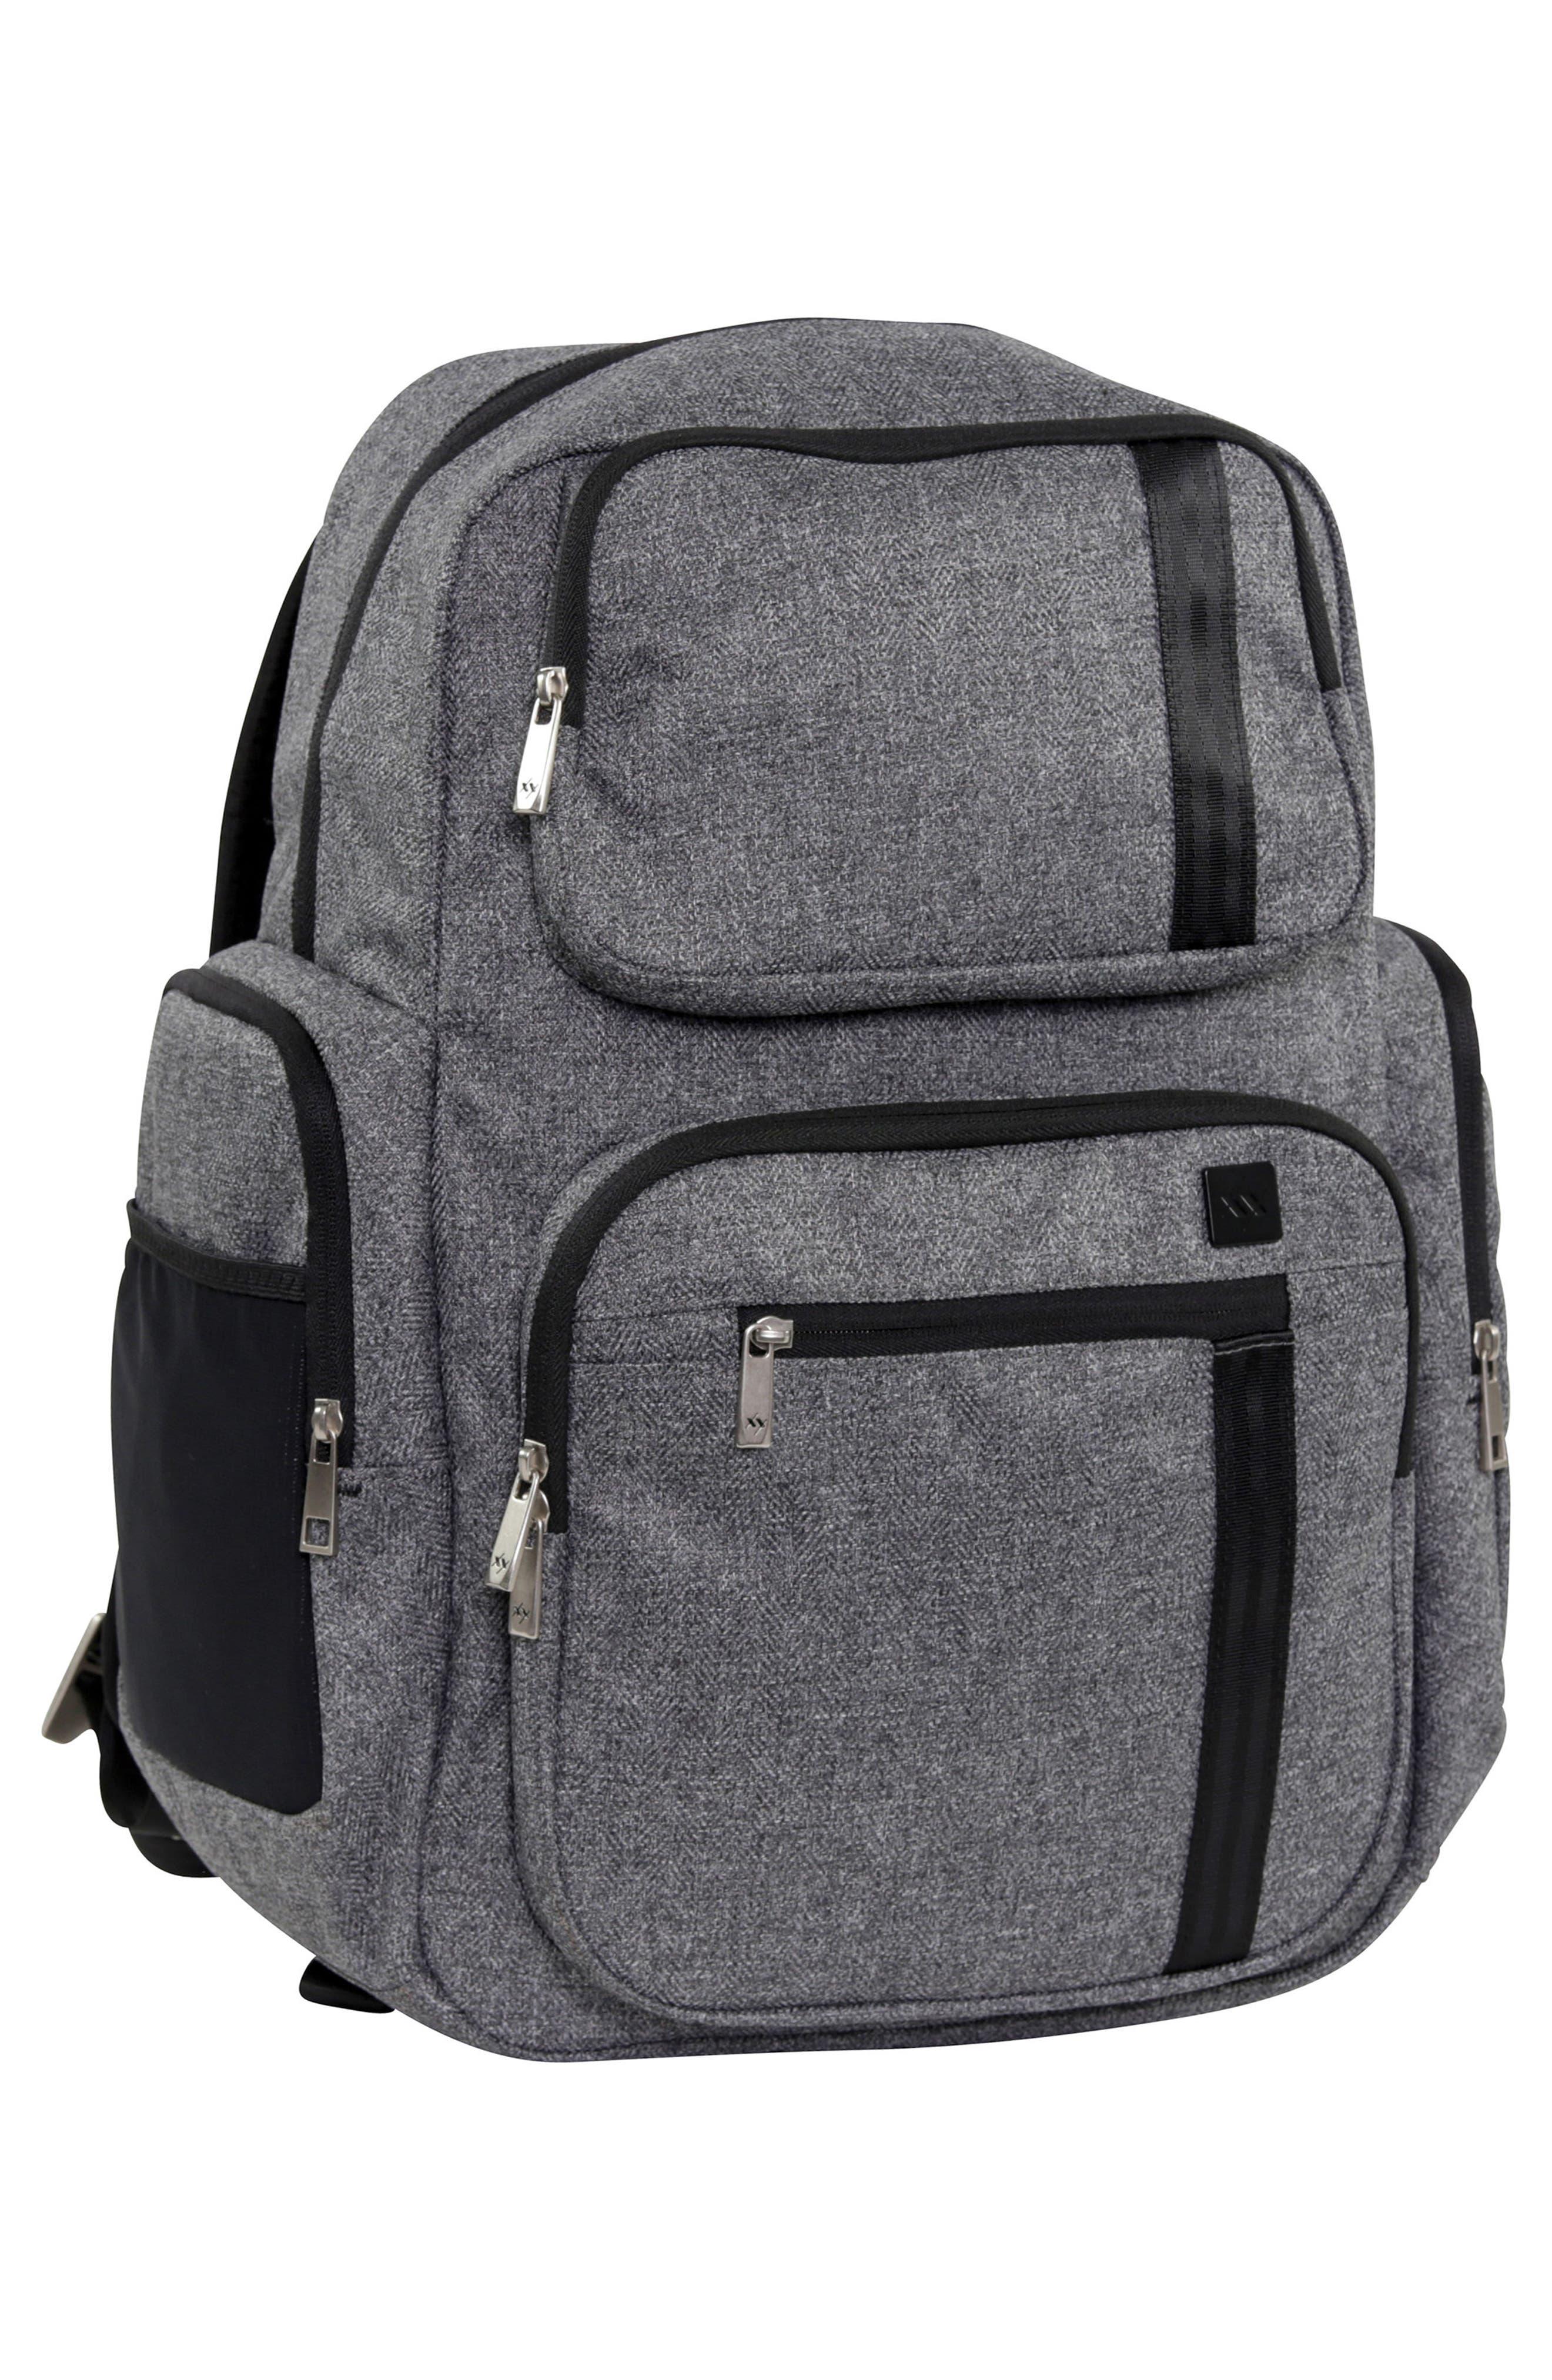 XY Vector Diaper Backpack,                             Alternate thumbnail 5, color,                             GRAY MATTER